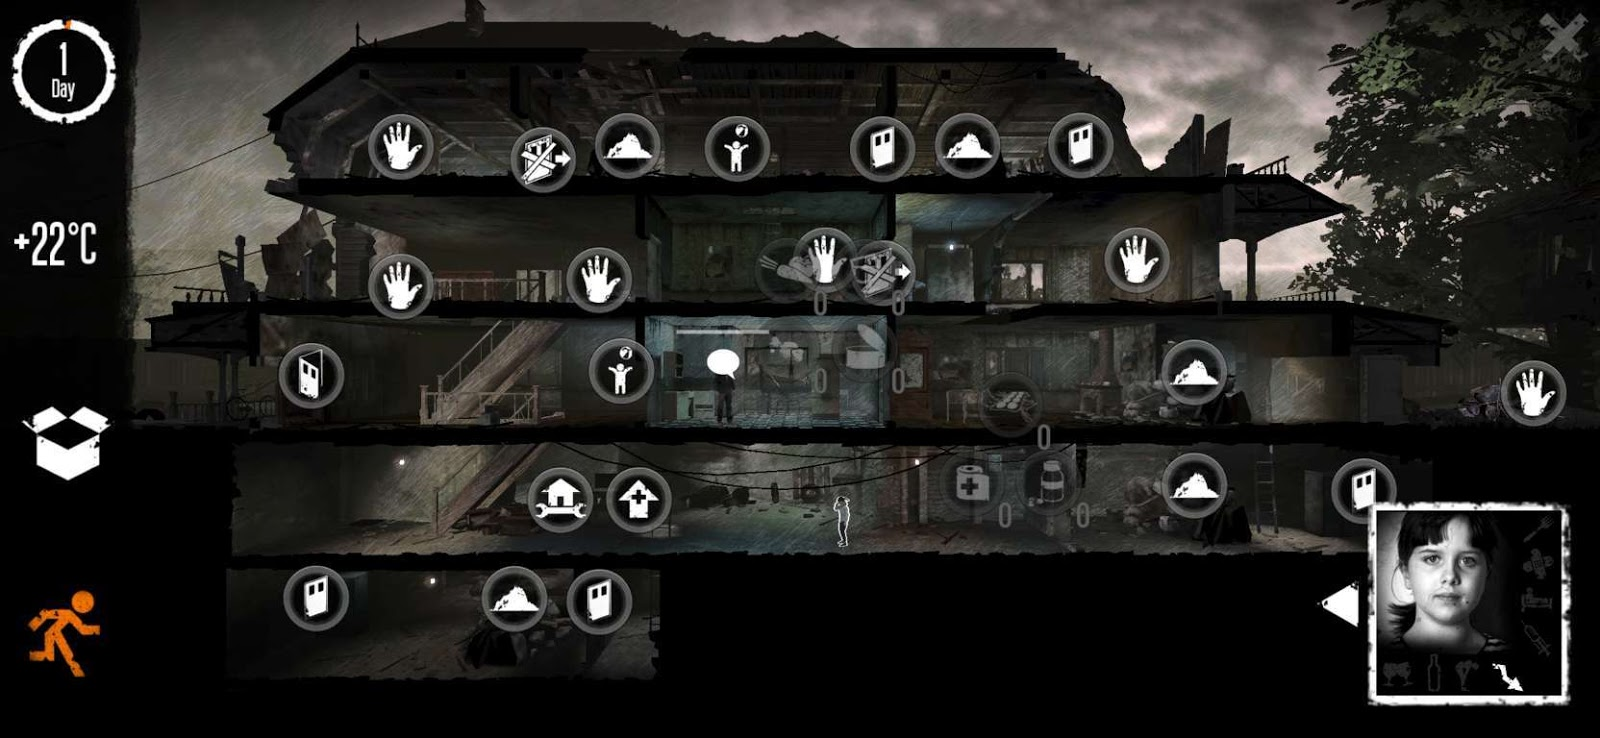 This War Of Mine Mod